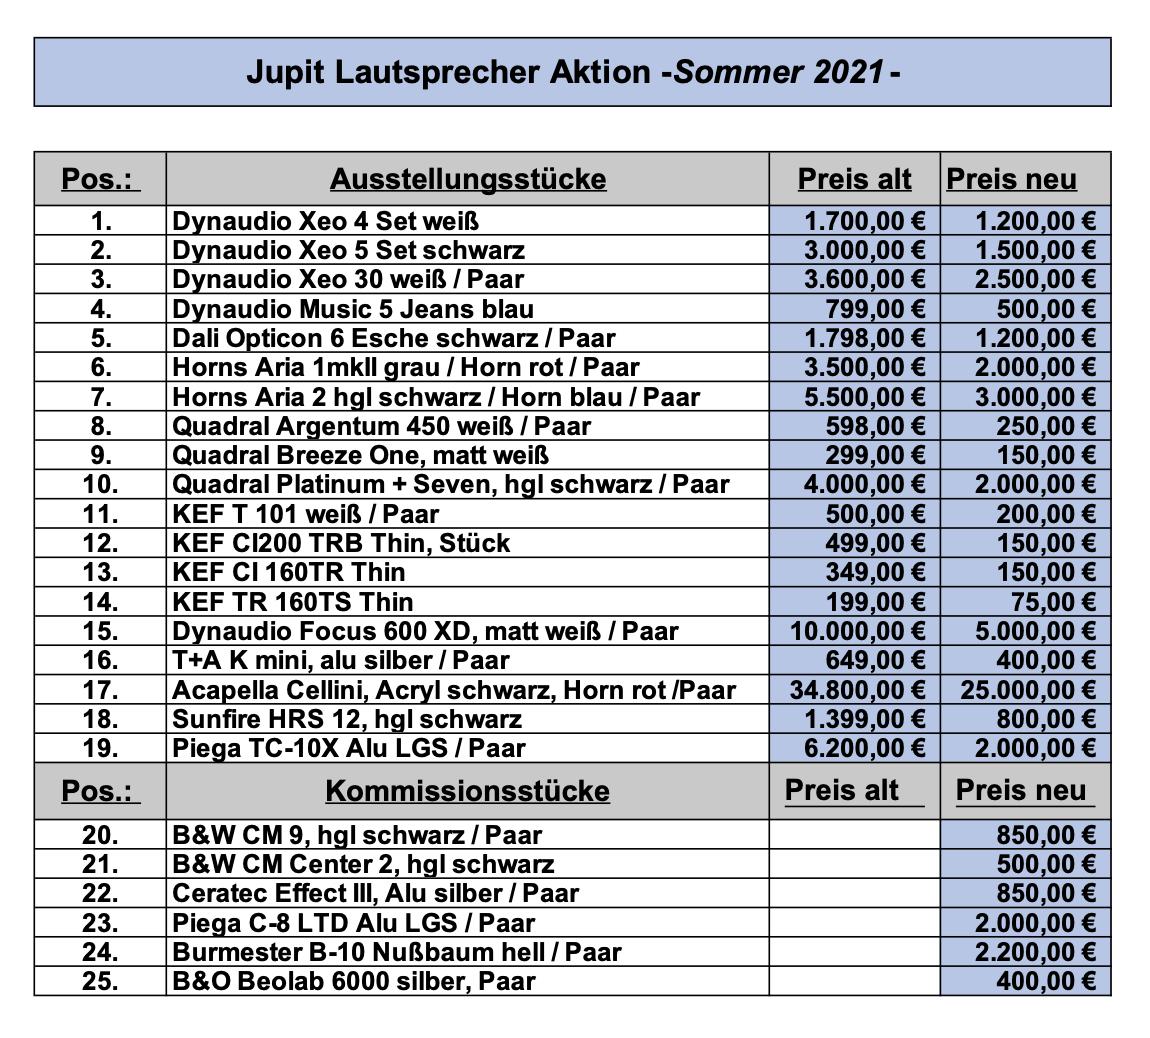 Jupit Lautsprecher Sommeraktion 2021.png